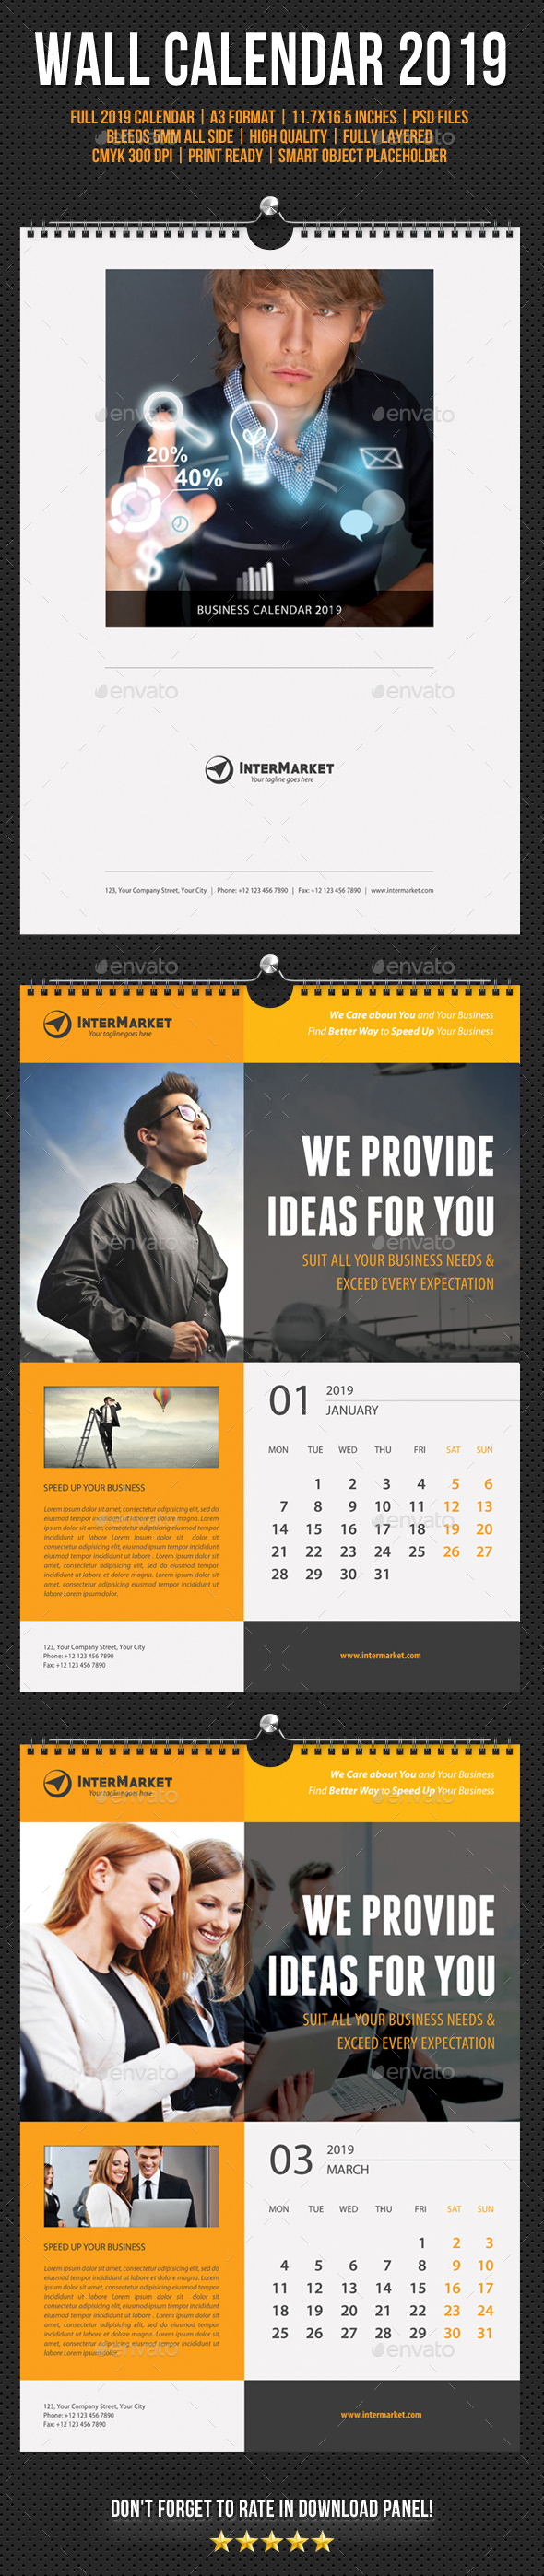 Corporate Wall Calendar 2019 V01 - Calendars Stationery